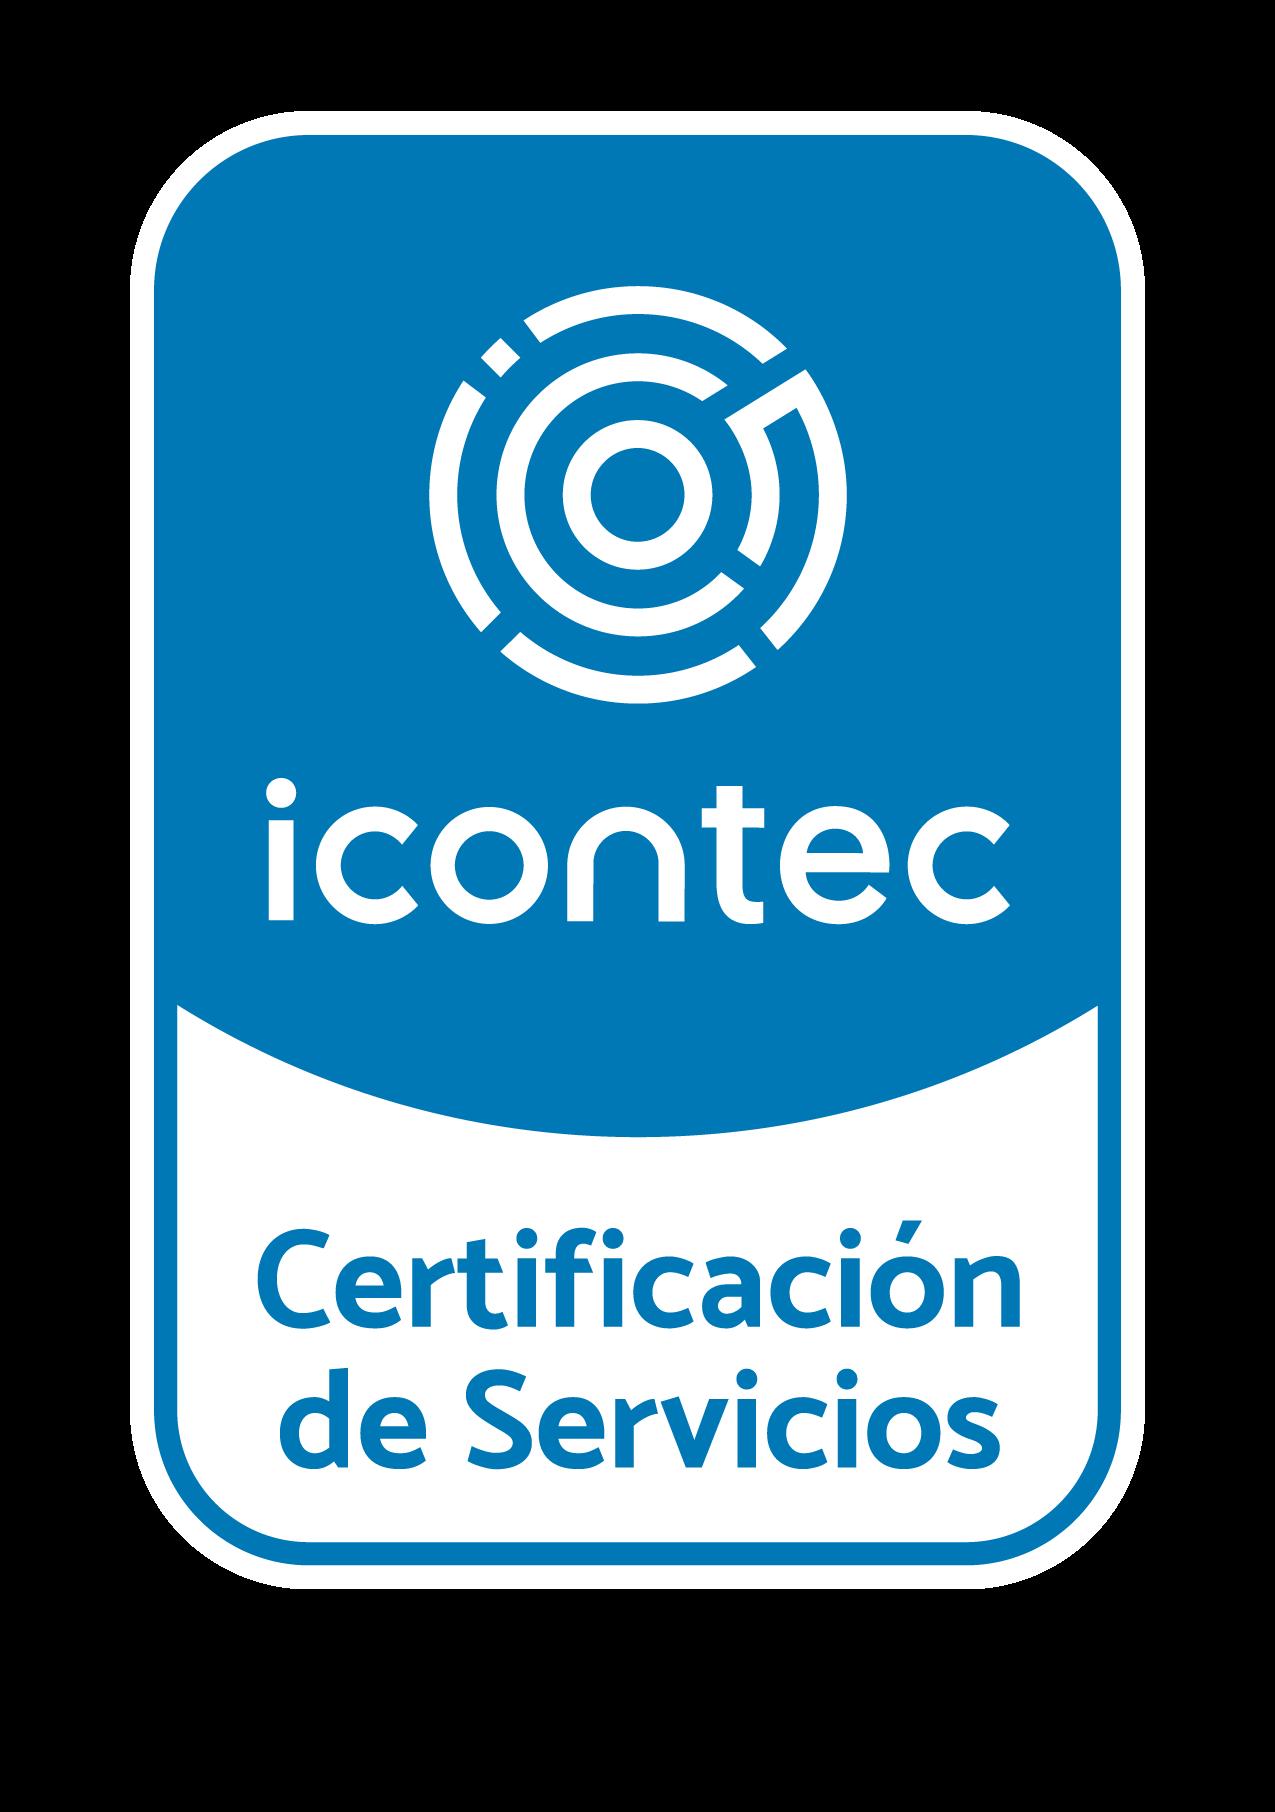 logos icontec-03